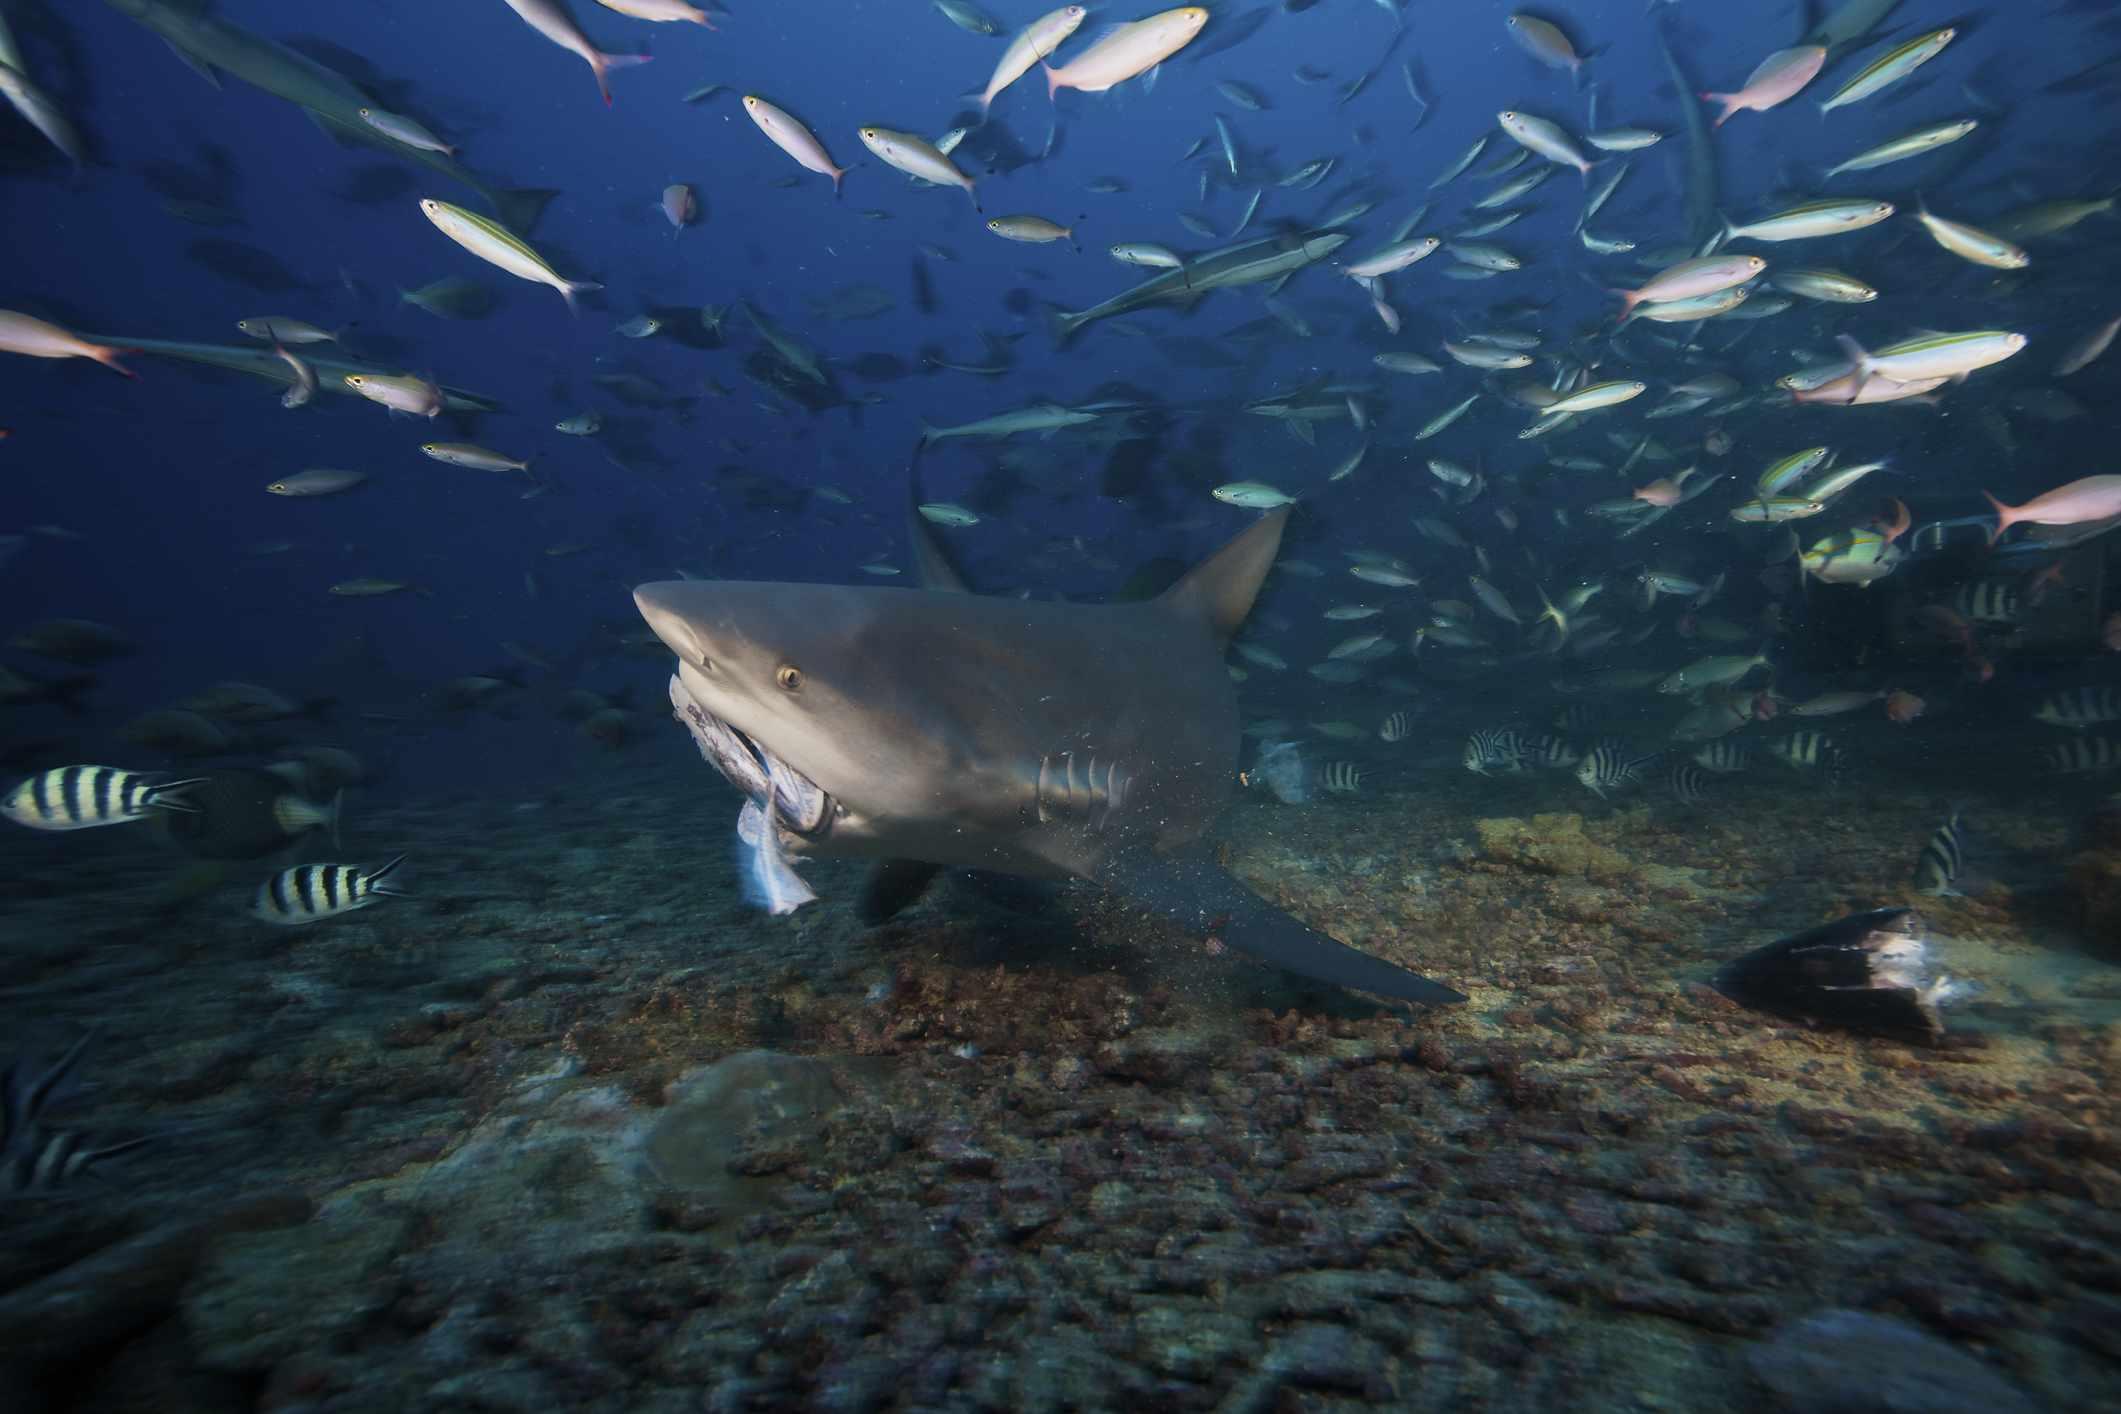 A bull shark bites into a tuna off the coast of Fiji.